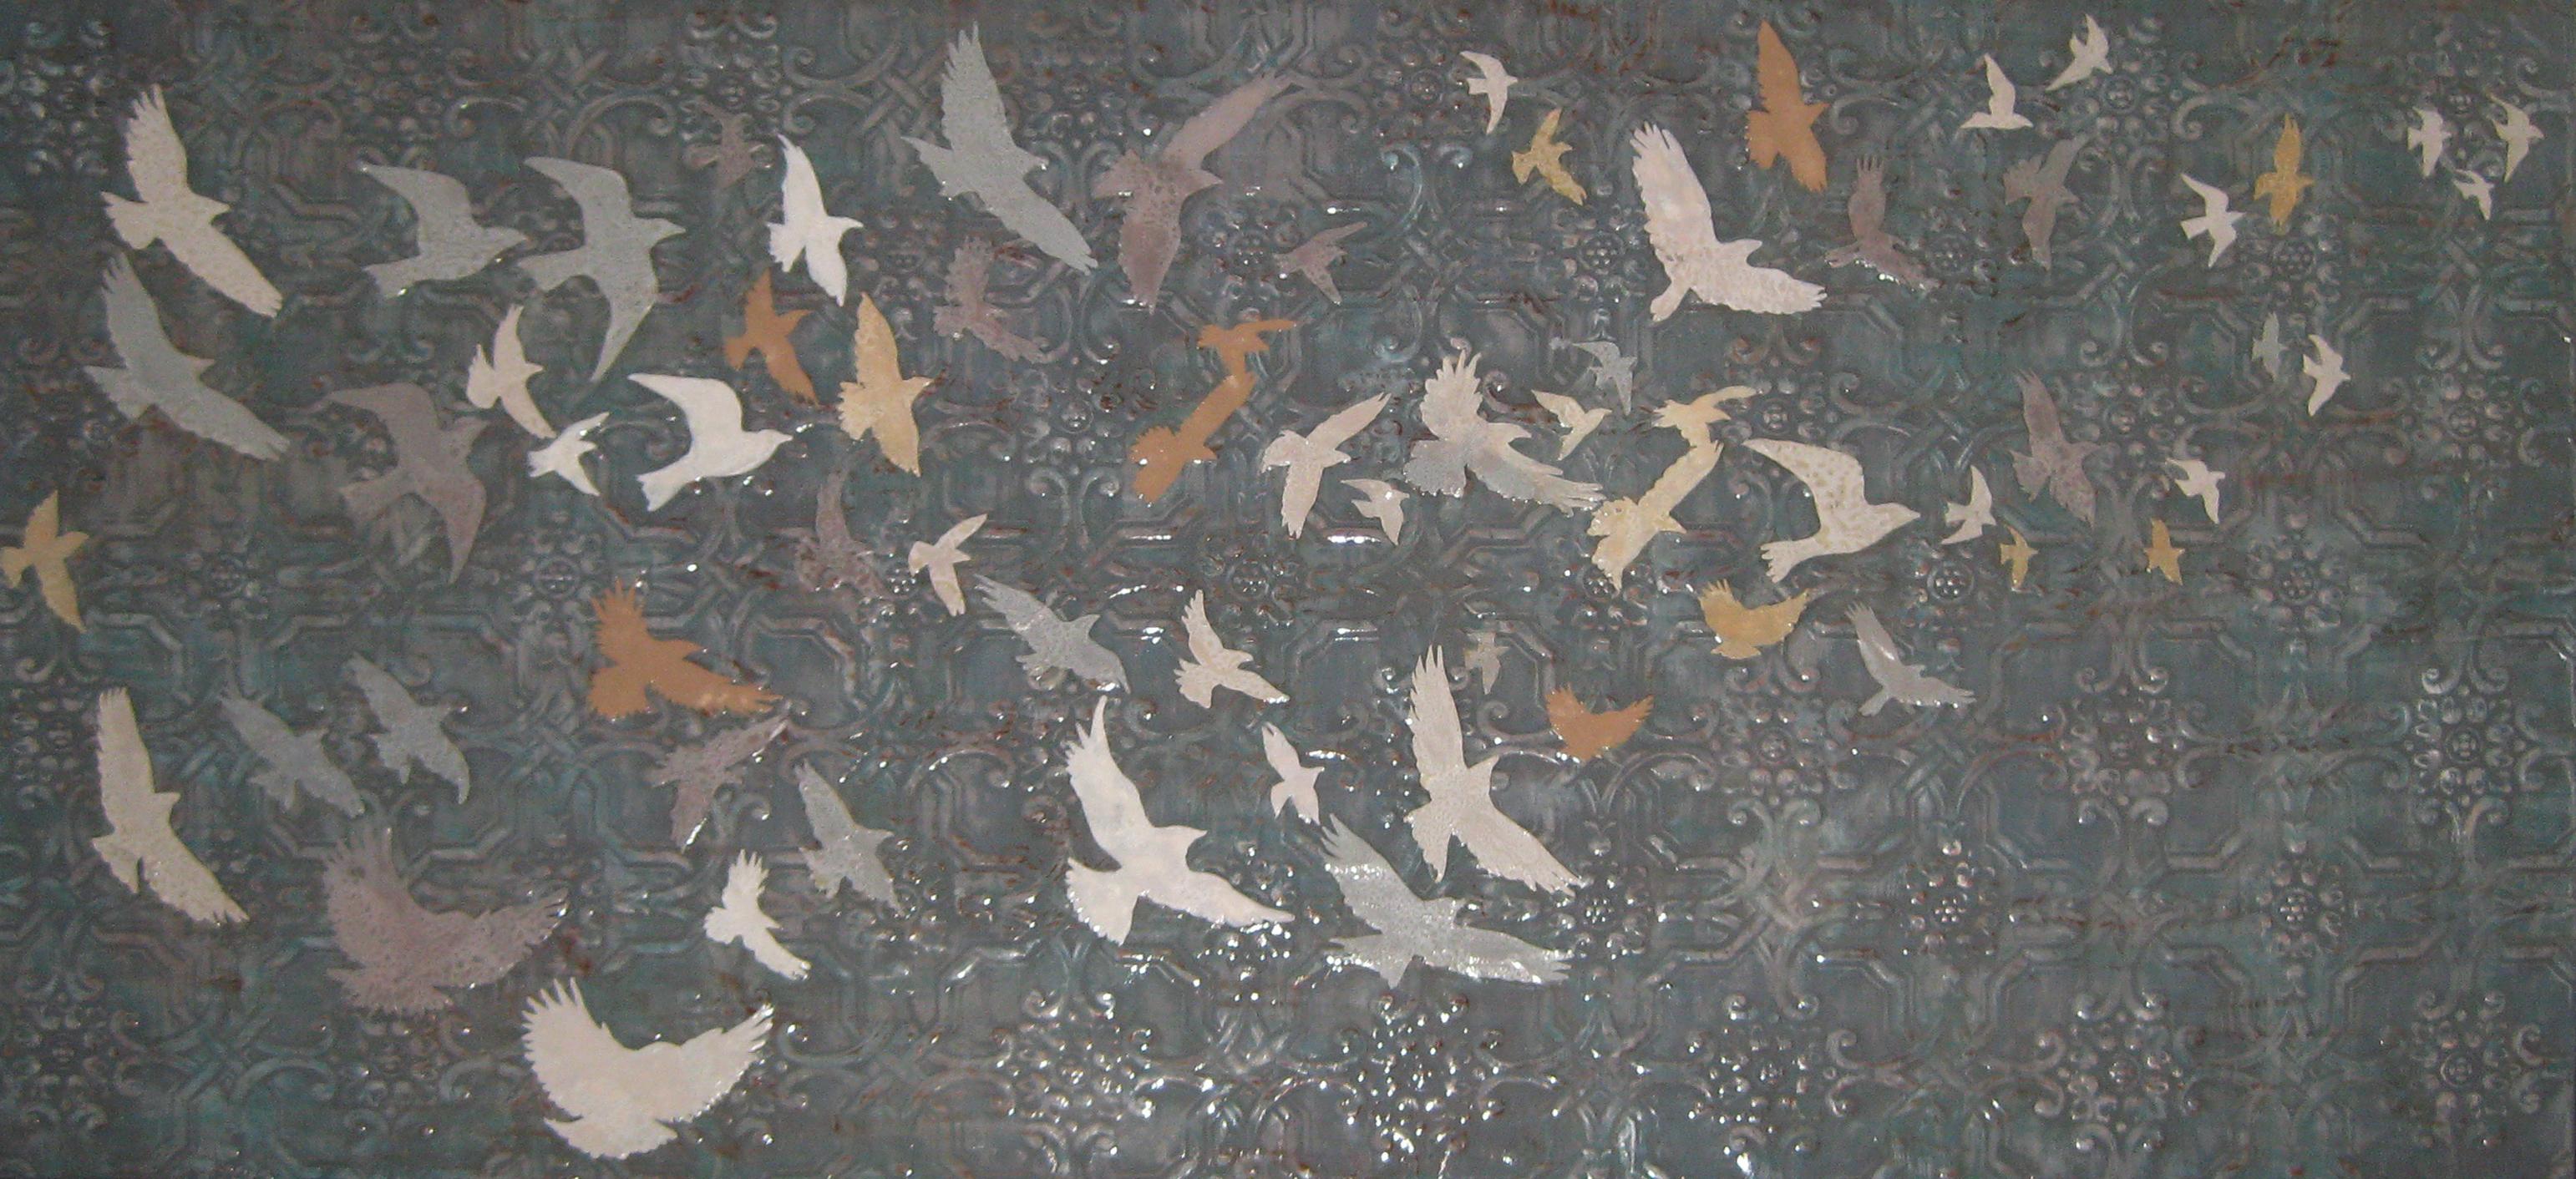 Bird Pattern Wide Wallpaper in High Resolution at Patterns Wallpaper 3084x1412